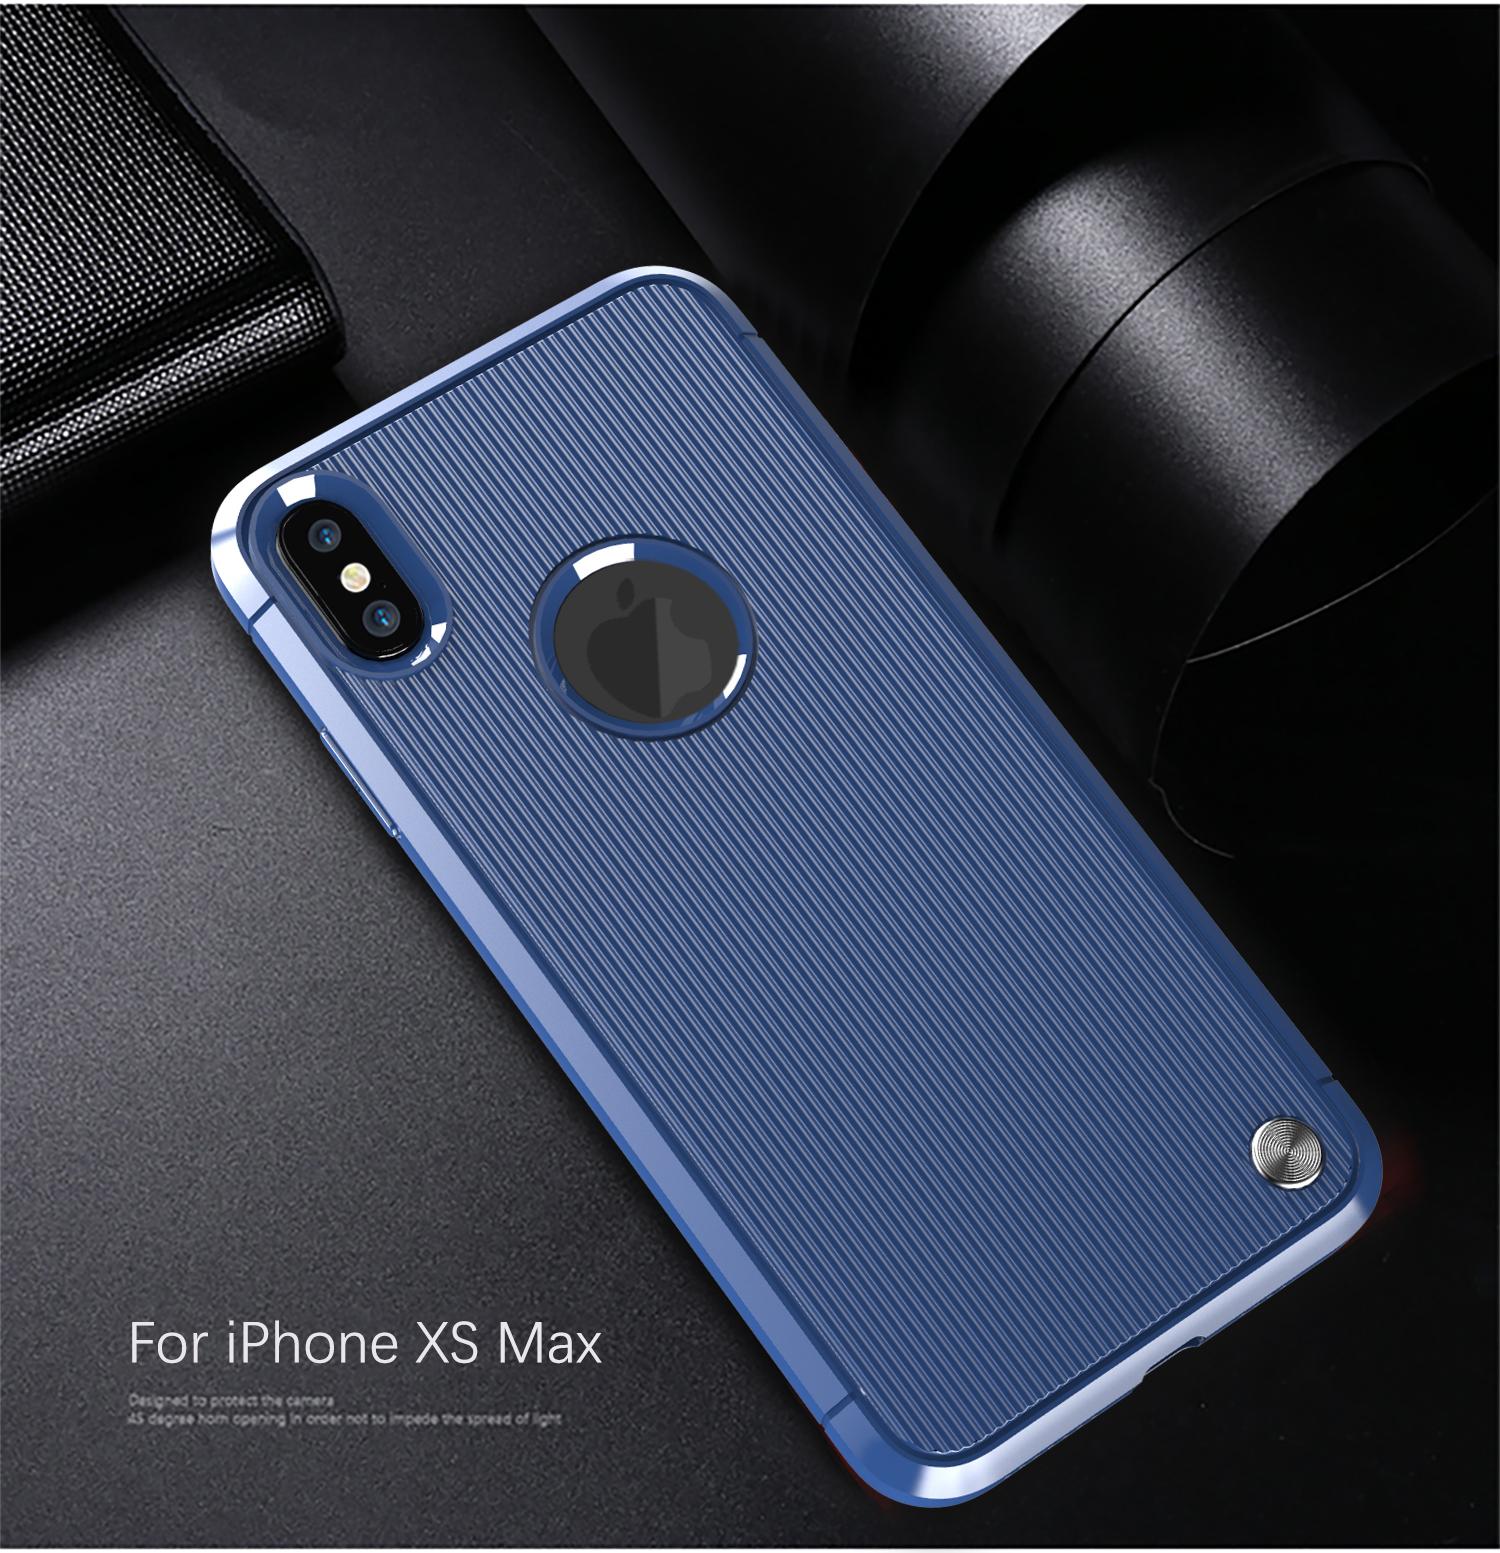 Чехол для iPhone XS Max цвет Blue (синий), серия Bevel от Caseport